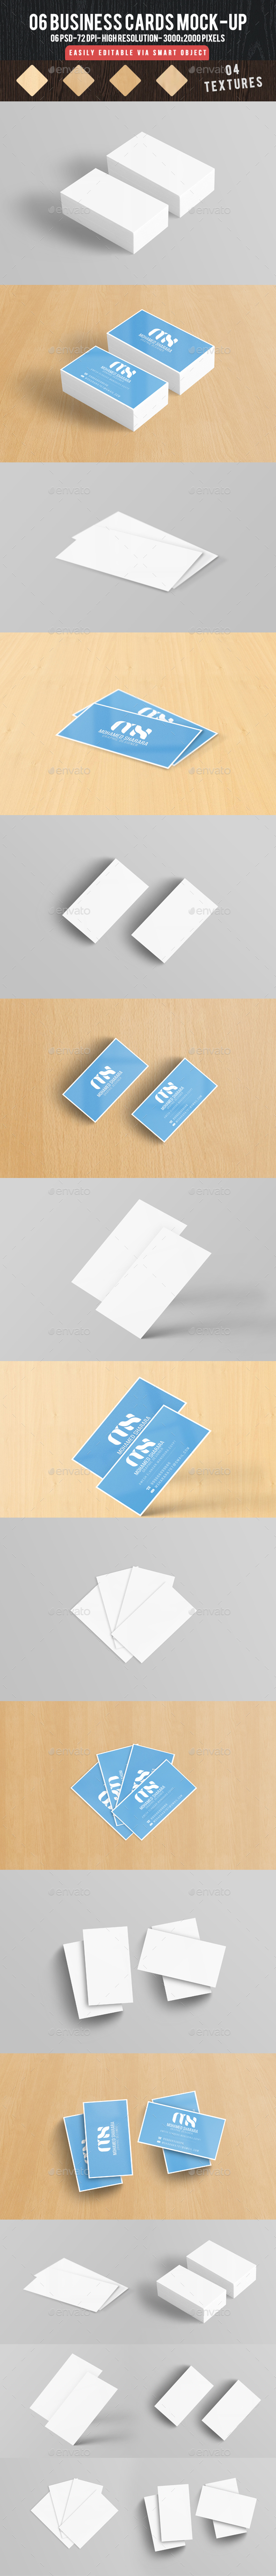 06 Business Card Mock-ups - Business Cards Print